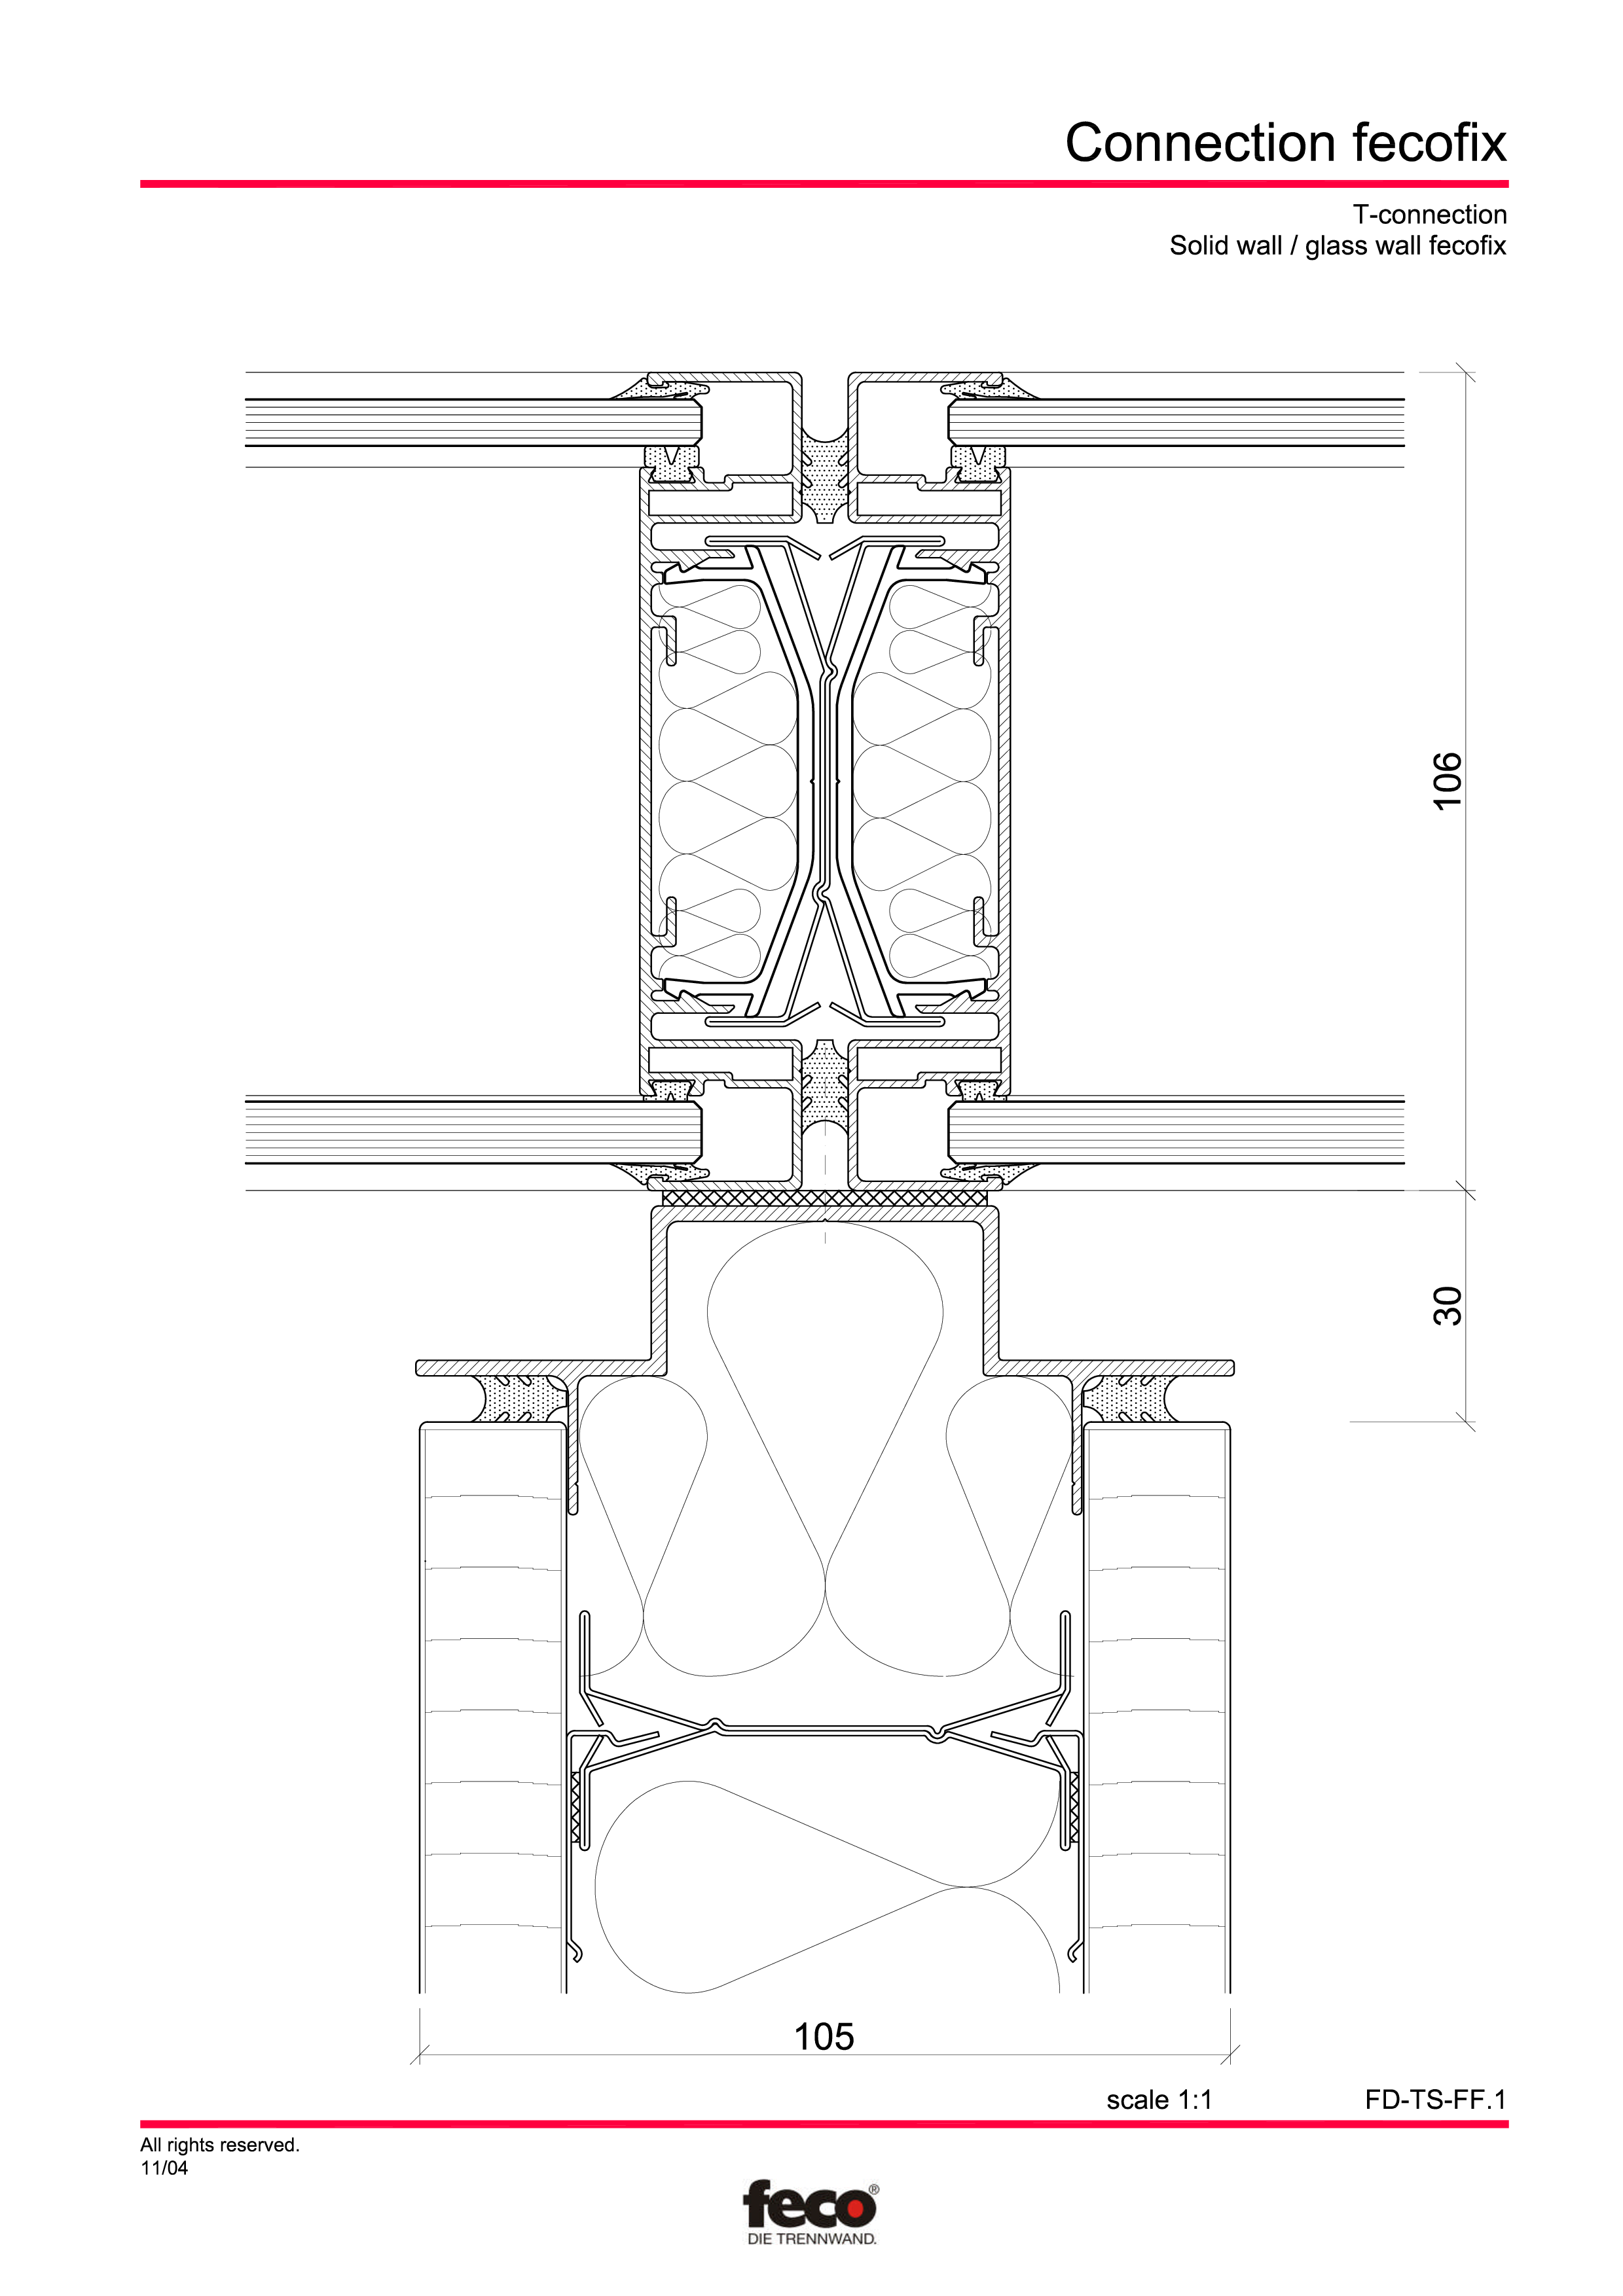 Pagina 6 - CAD-PDF Detaliu racord pereti FECO Detaliu de montaj FecoPur, FecoFix, FecoLux